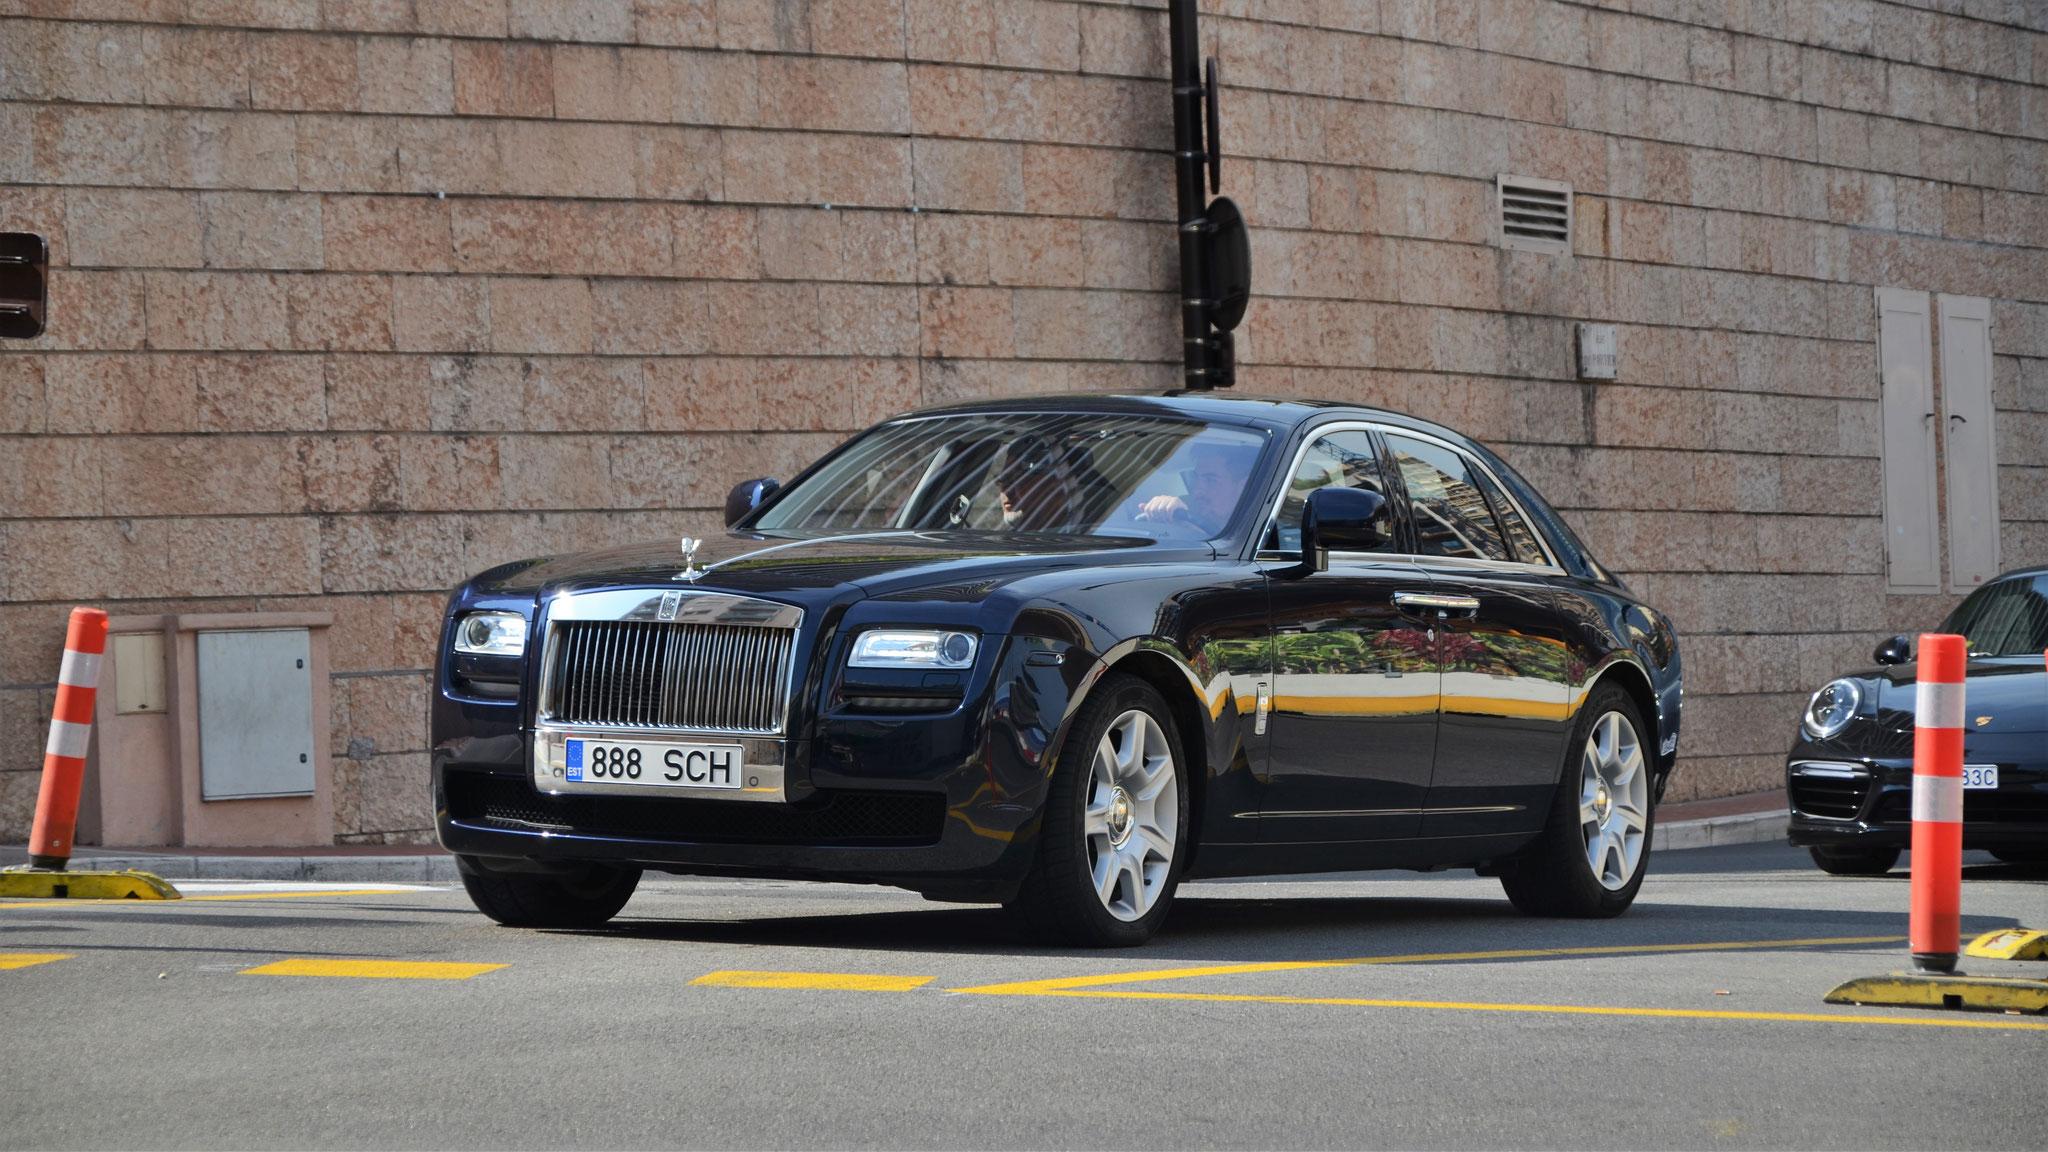 Rolls Royce Ghost - 888-SCH (EST)